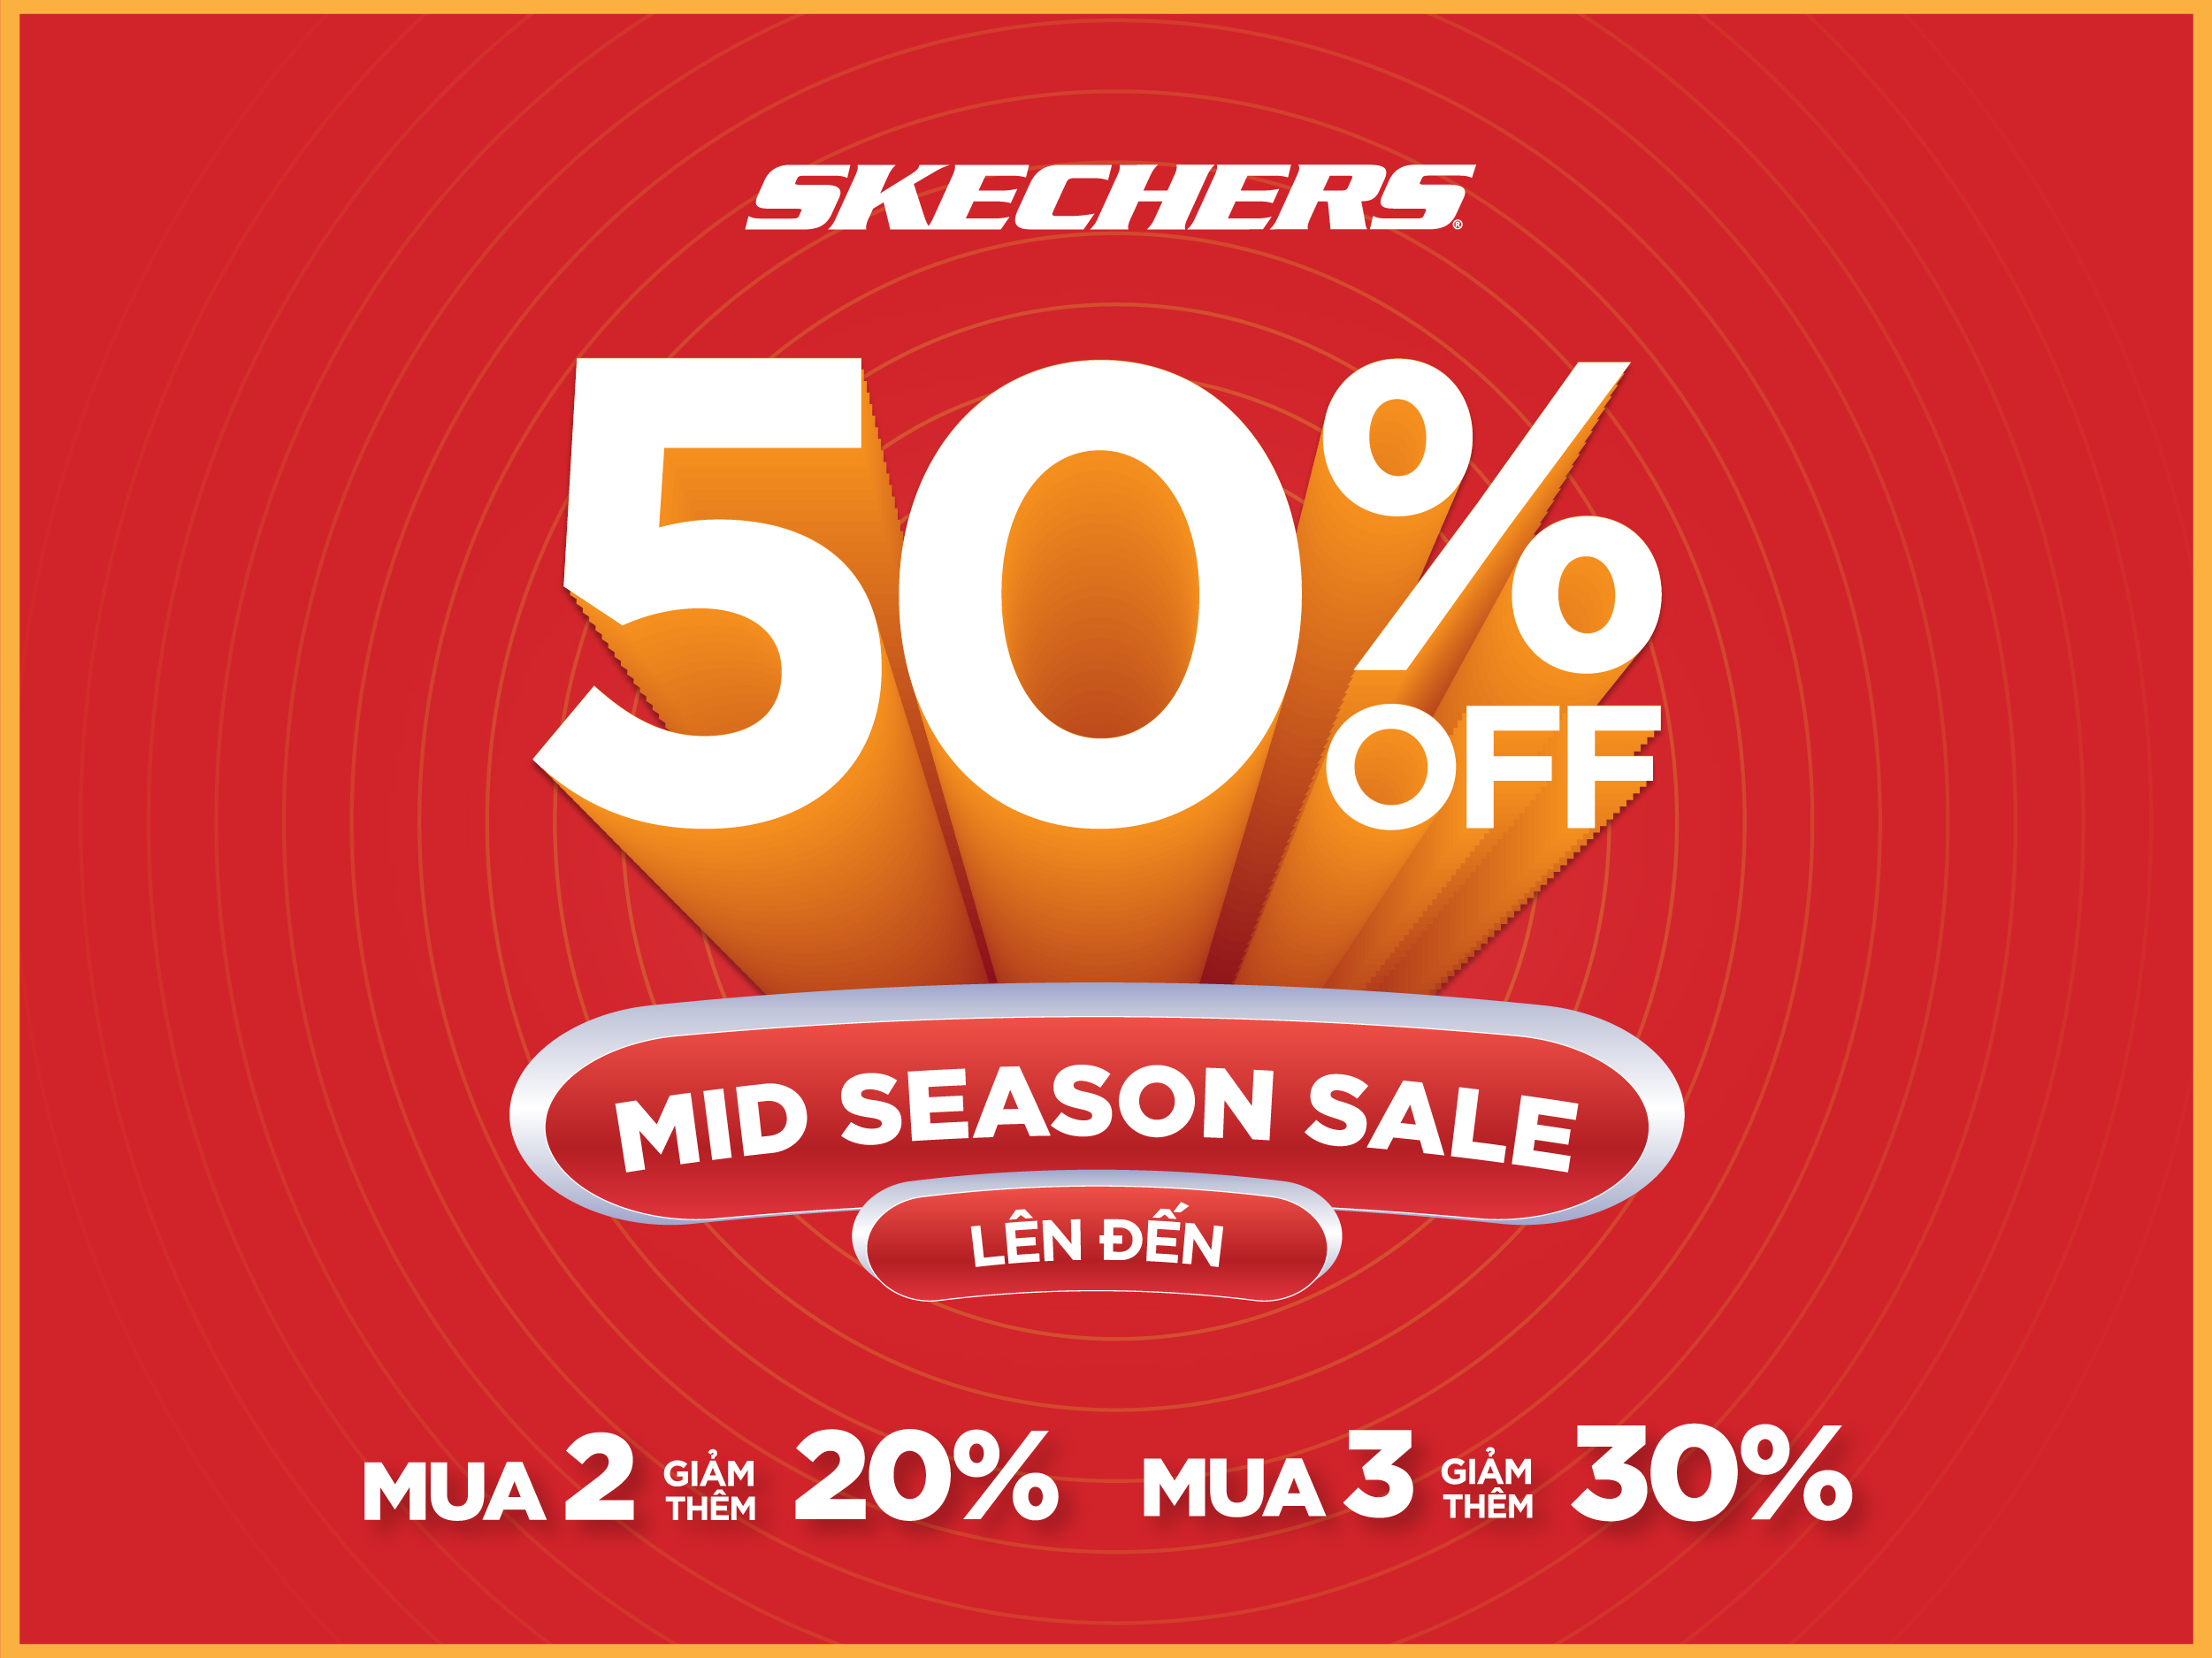 skechers ưu đãi 50%